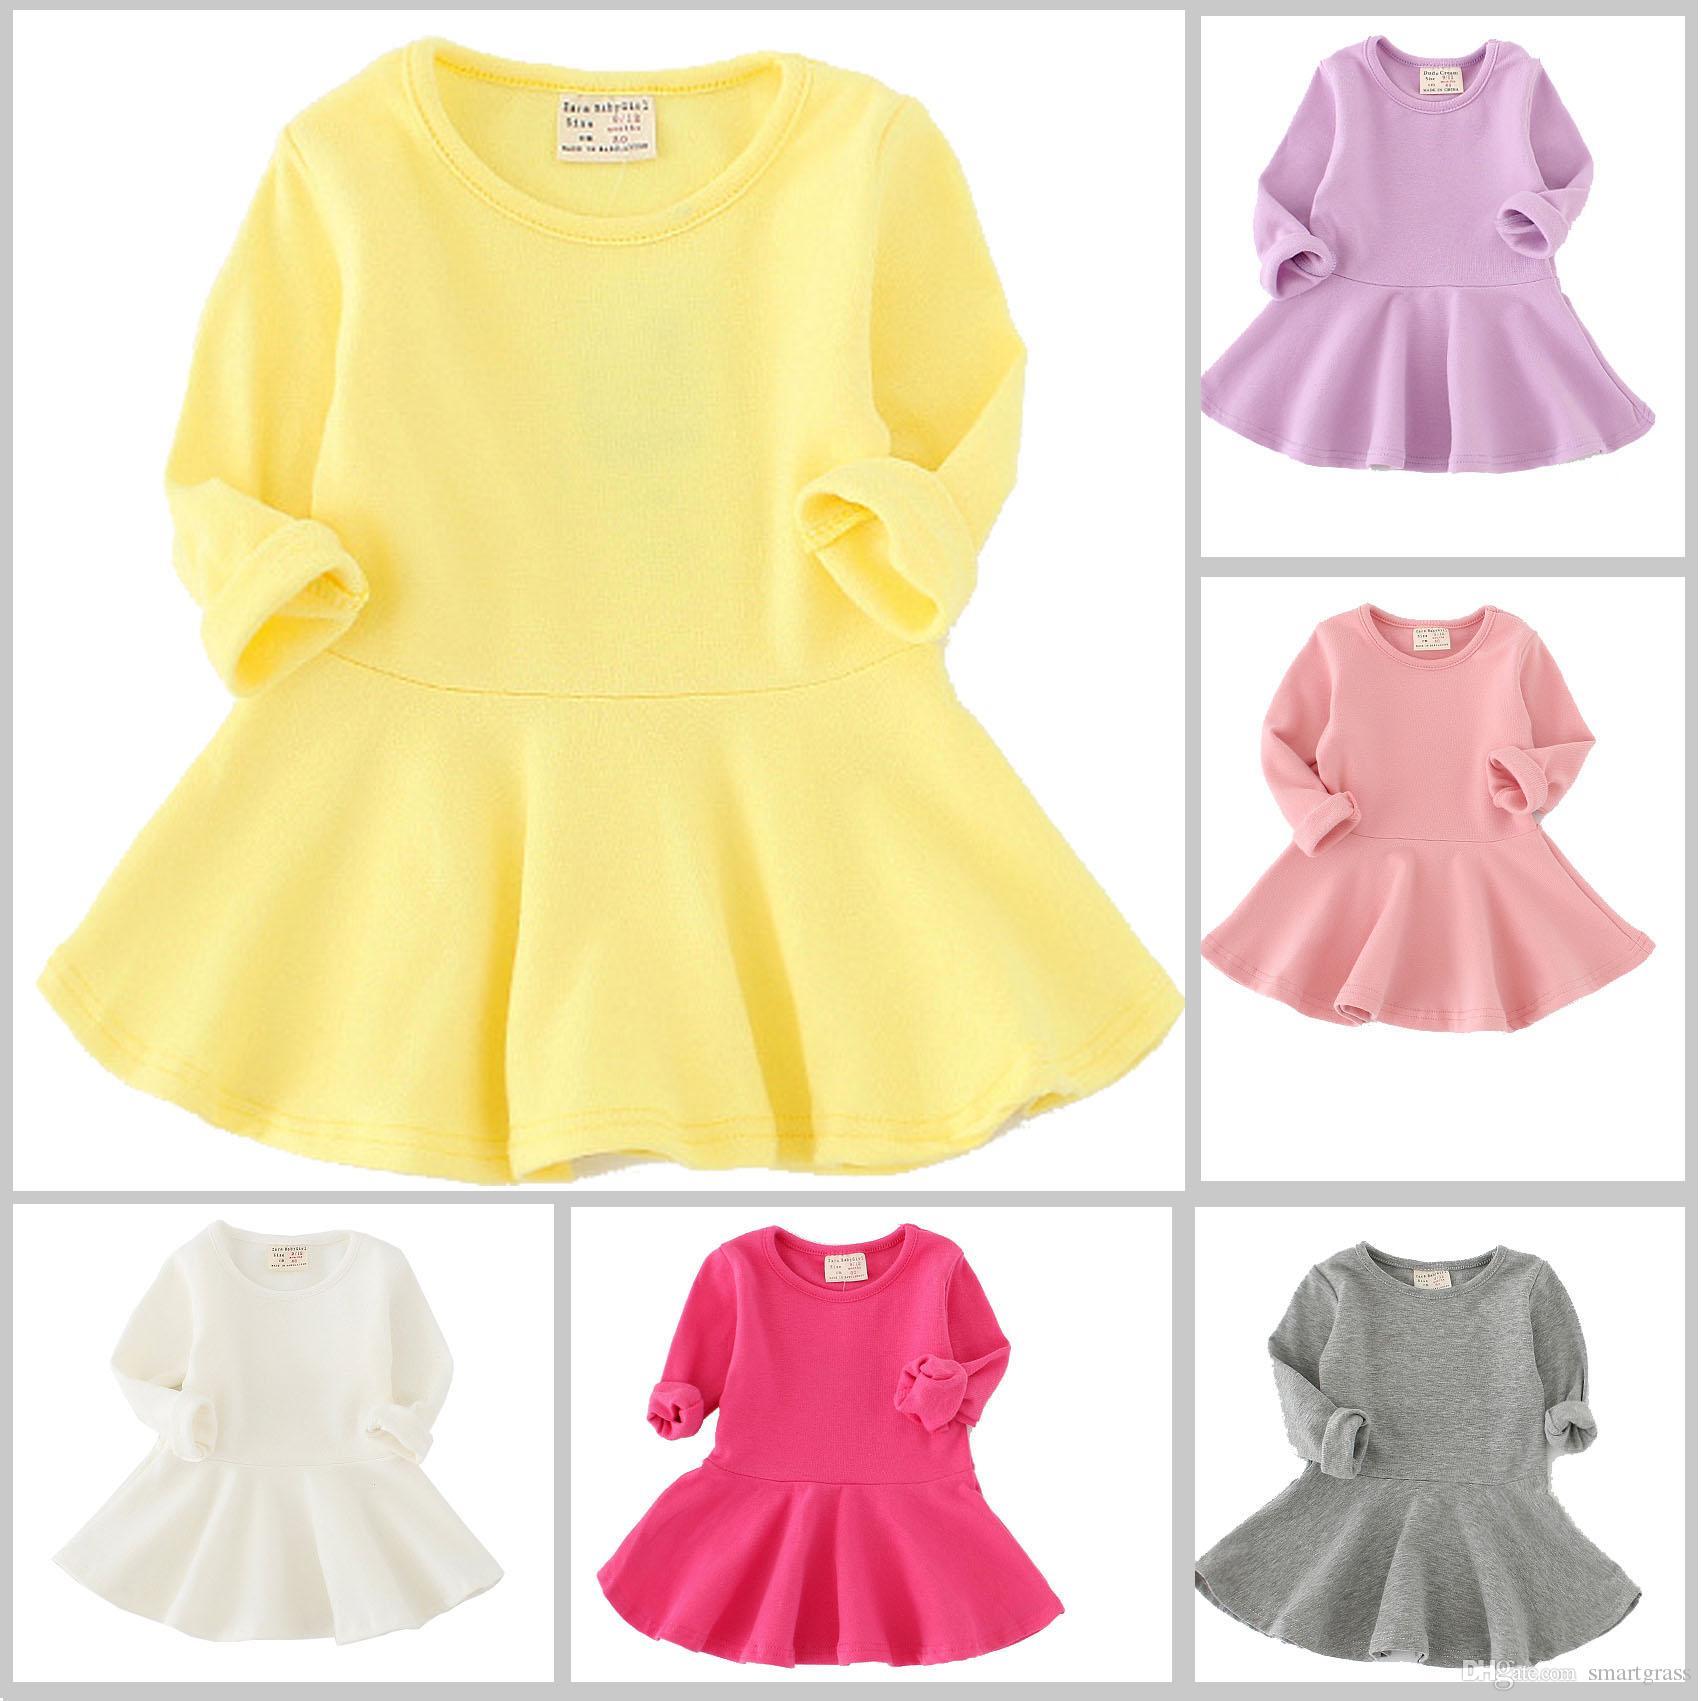 Autumn Girls Casual Dresses Cotton Long Sleeve Dress Ruffled Baby